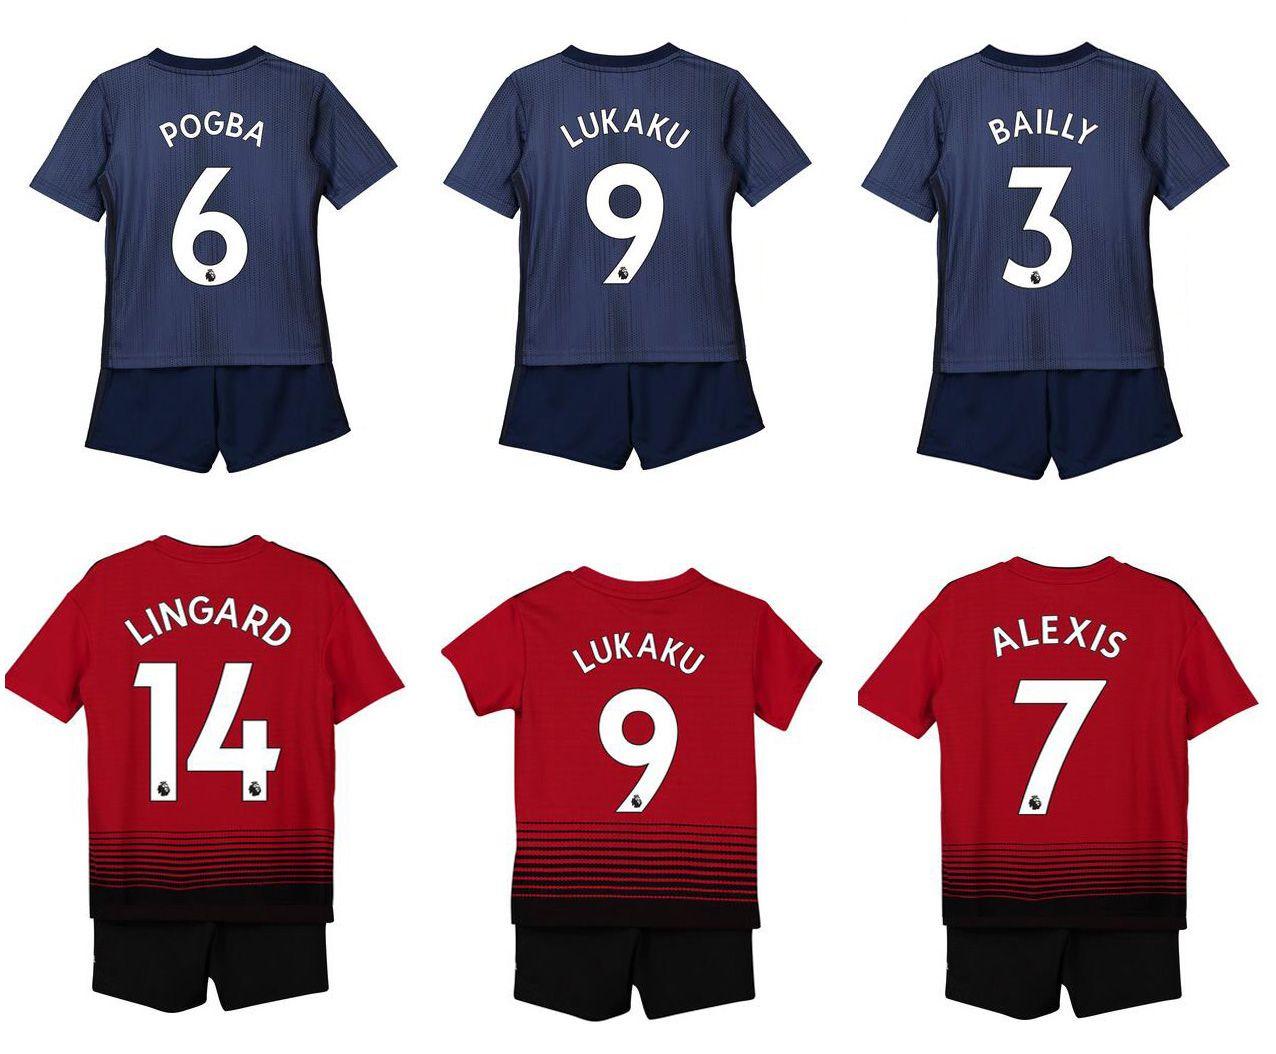 2932d9ad1 2019 2018 2019 Man Utd Kids  6 POGBA  7 ALEXIS Home Away Soccer Jerseys  Youth 18 19 Boys  9 LUKAKU Children Football Uniform Kits From Djohn66